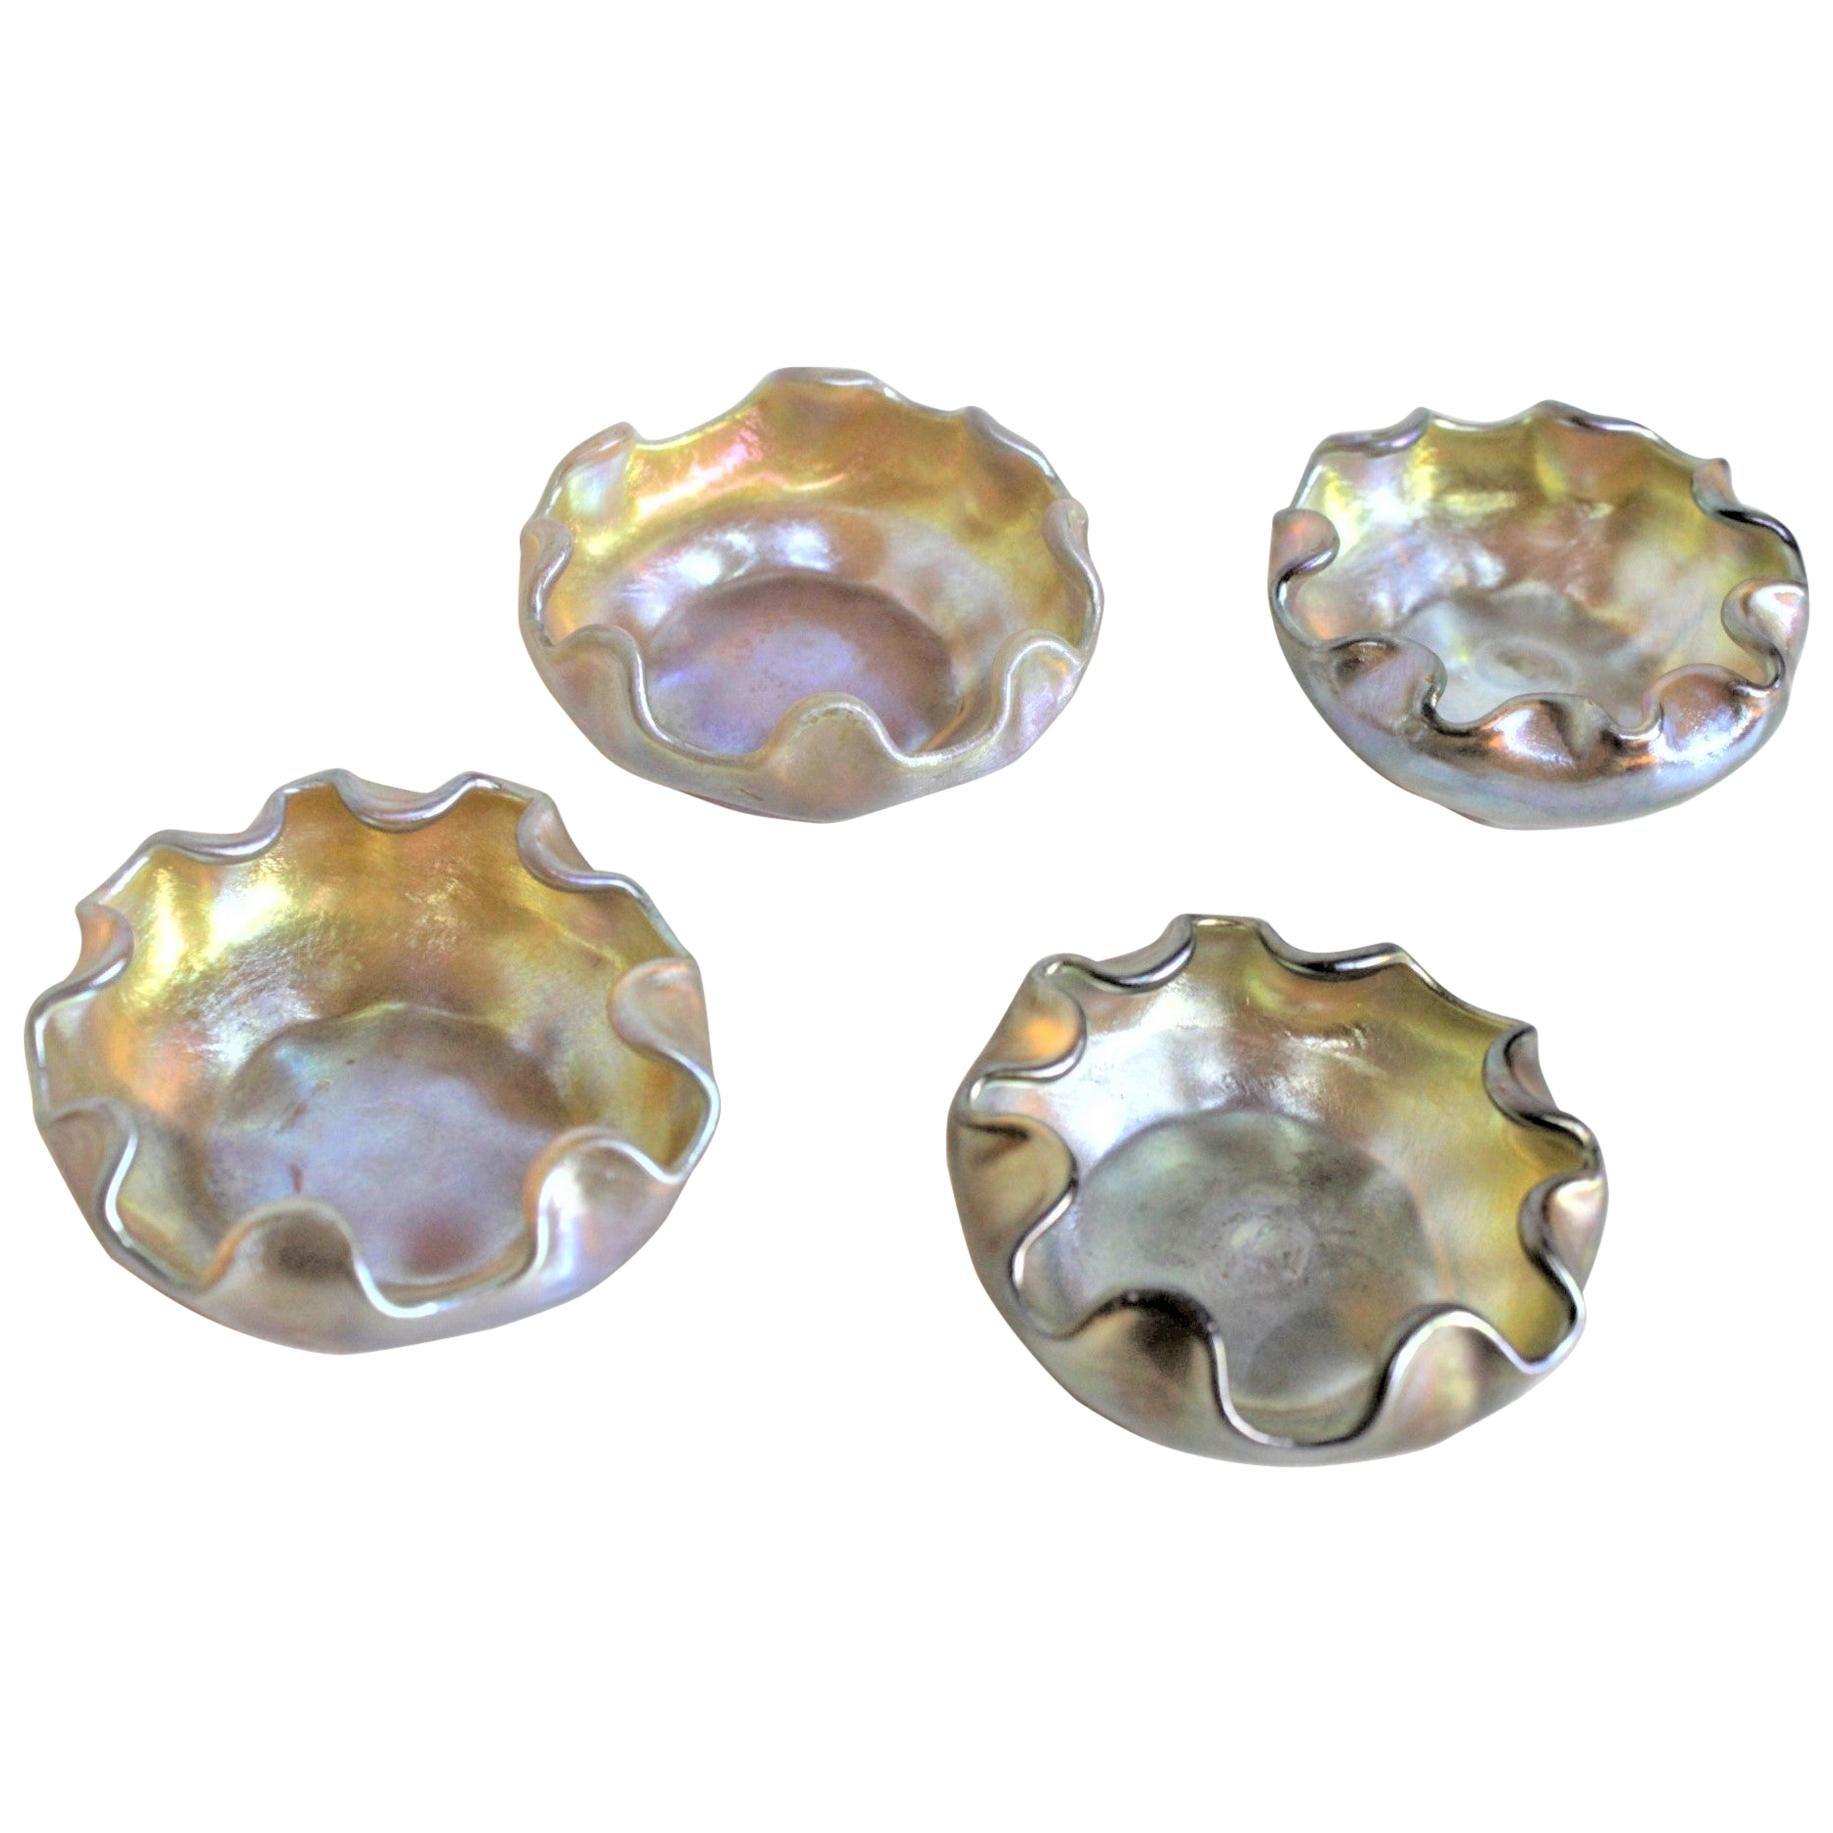 Louis Comfort Tiffany LCT Gold Favrile Art Glass Open Salt Cellar Set